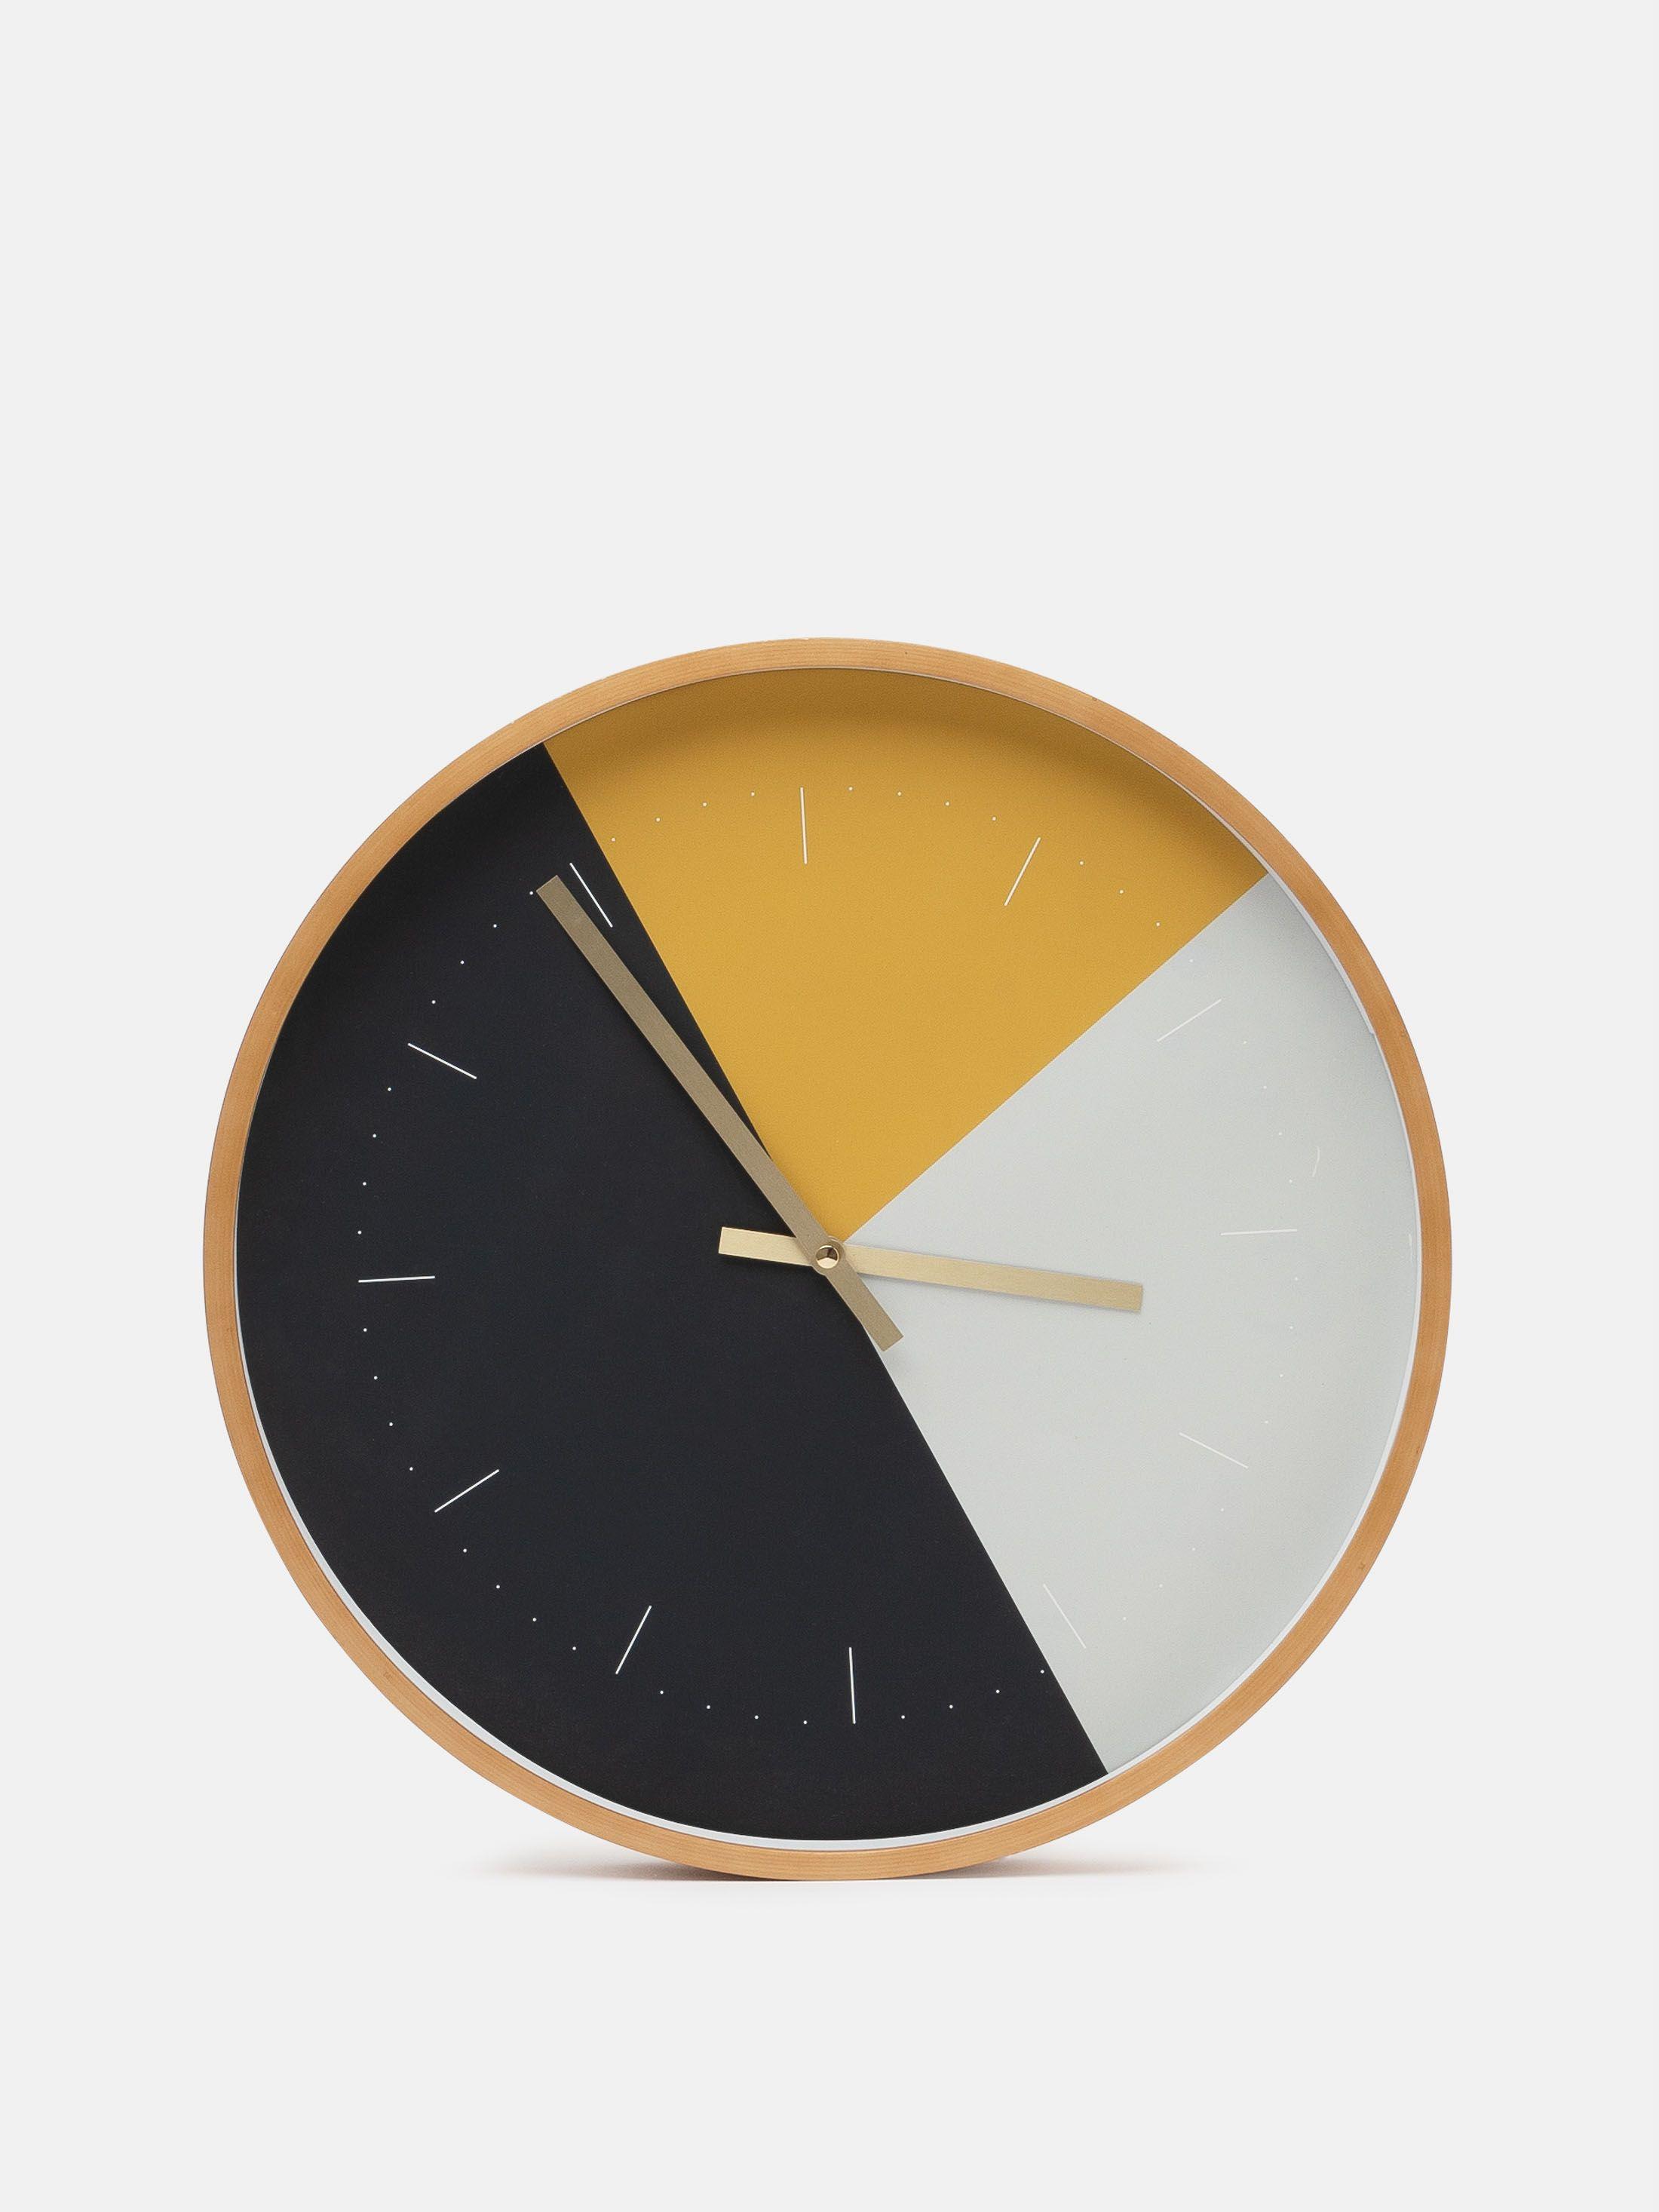 Horloge murale ronde modèle Larson